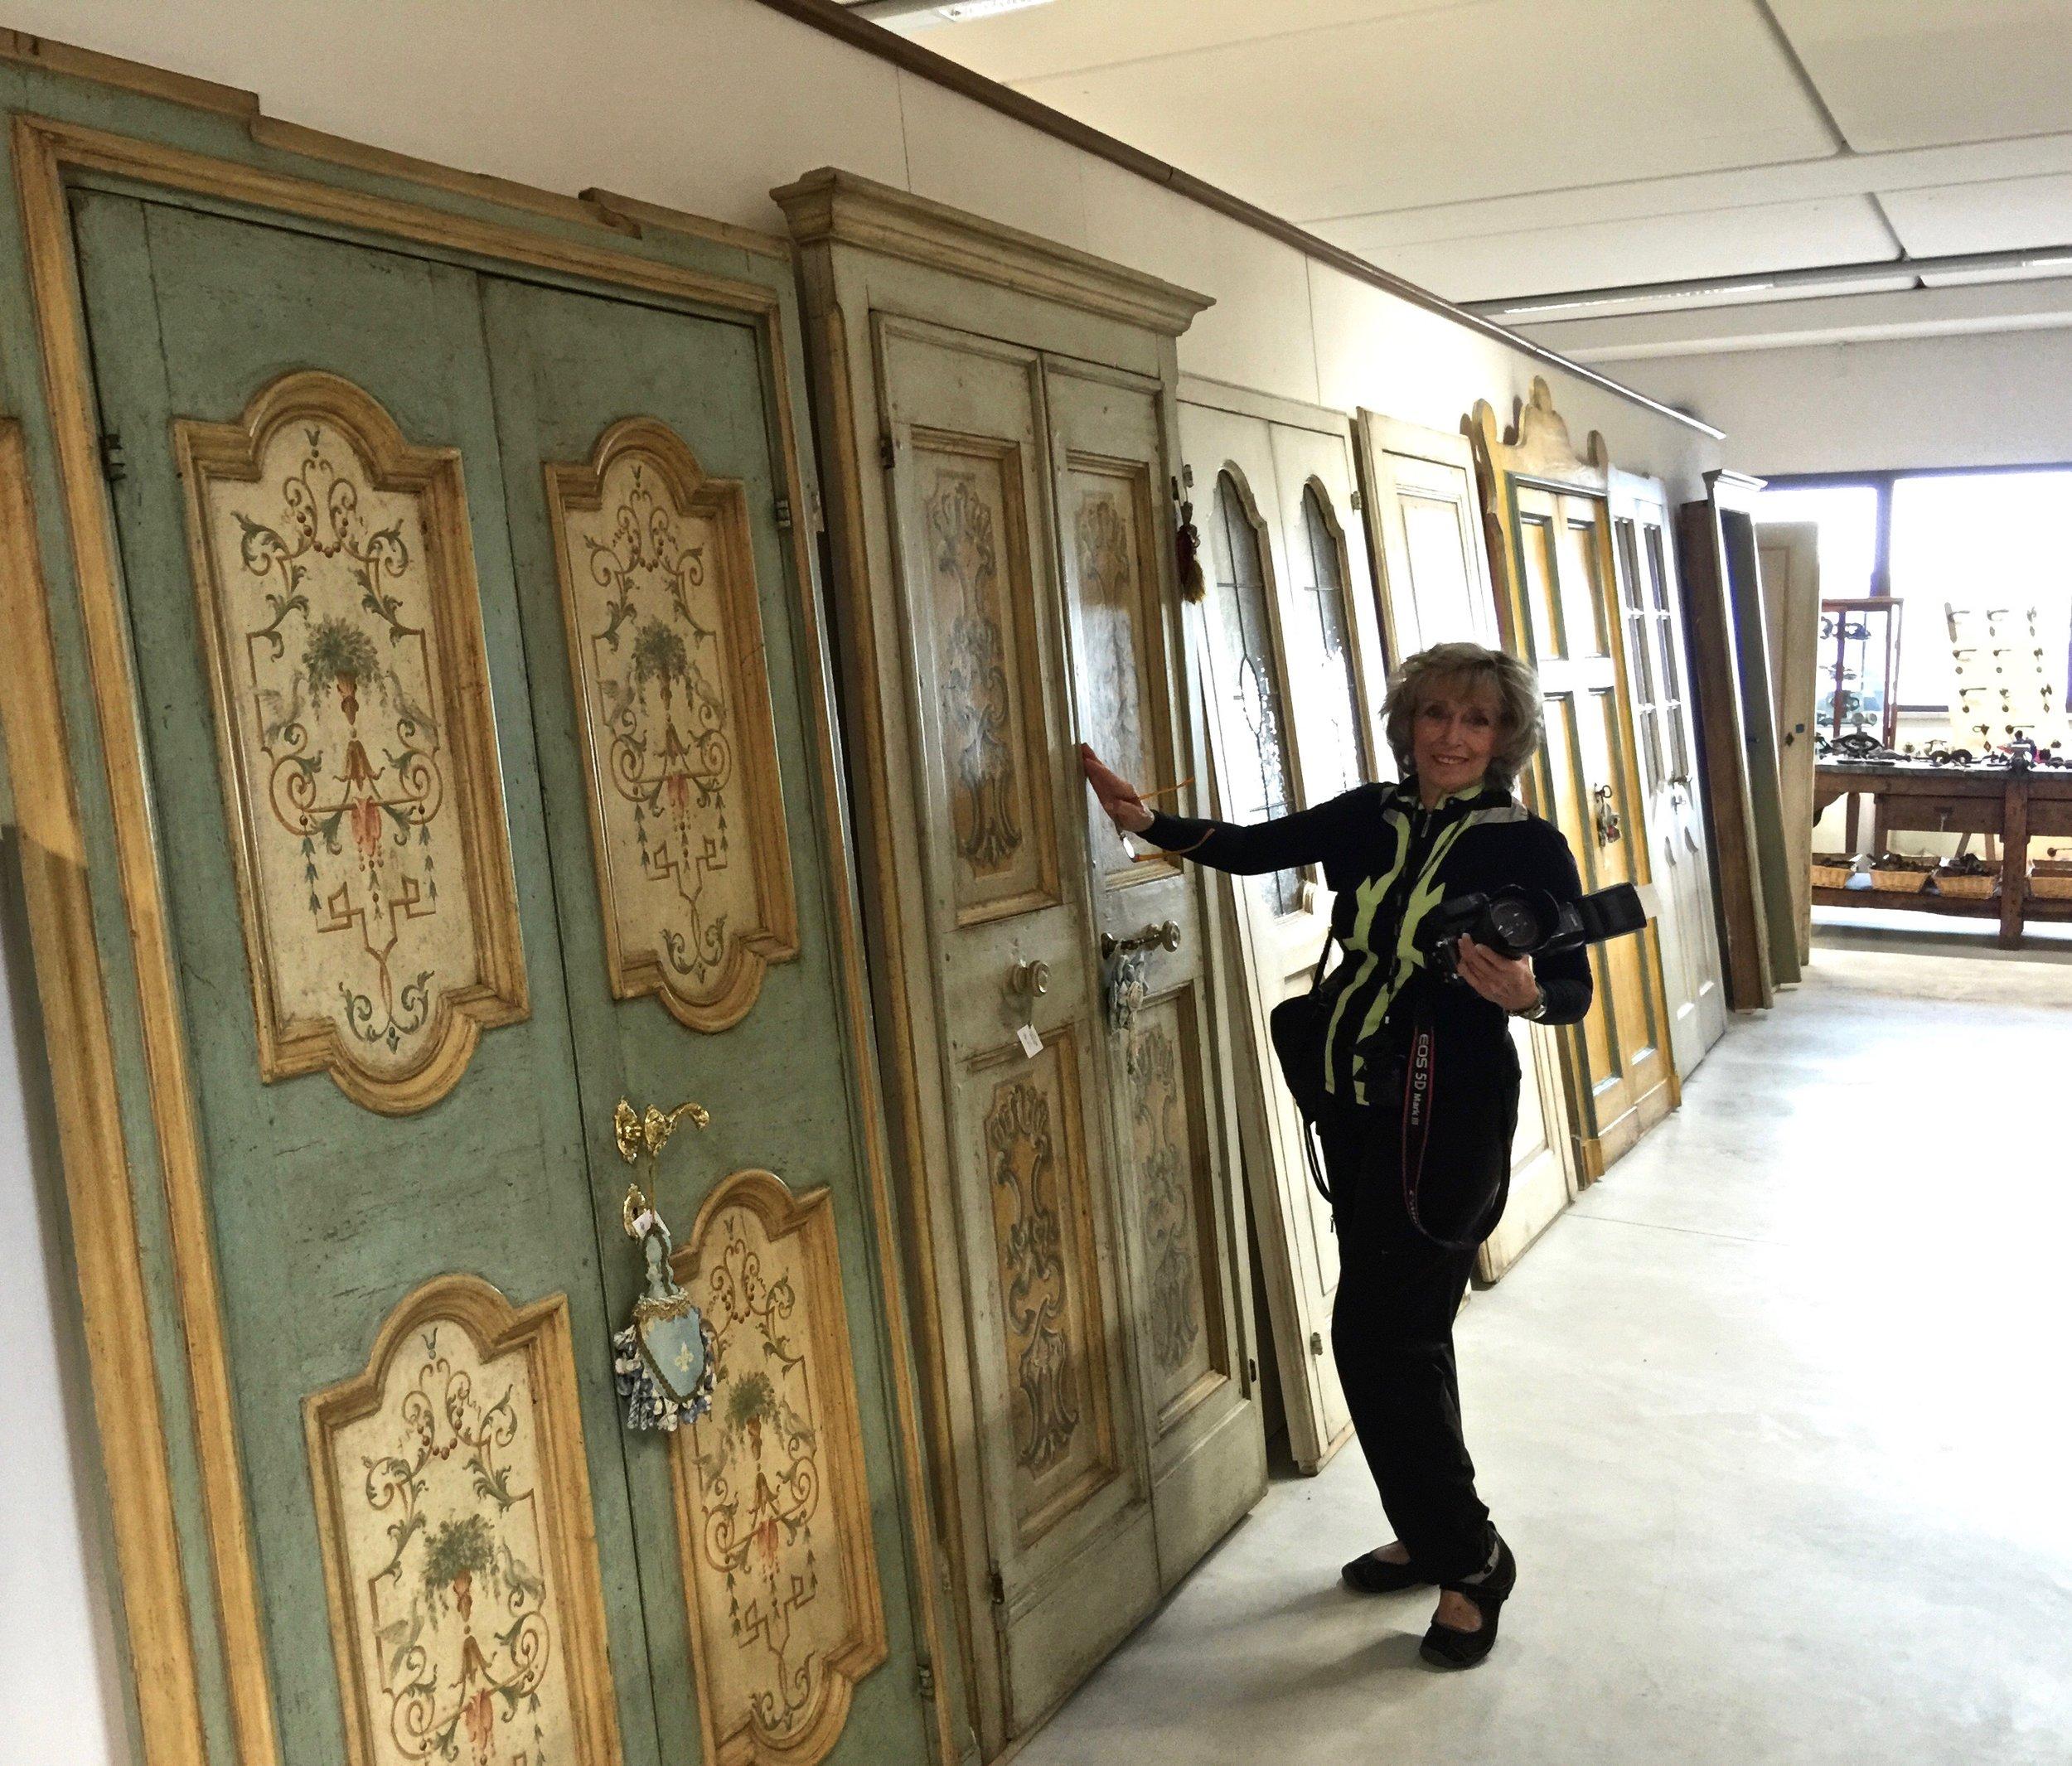 Phyllis selecting her doors at Porte del Passato in Umbria, Italy 2015